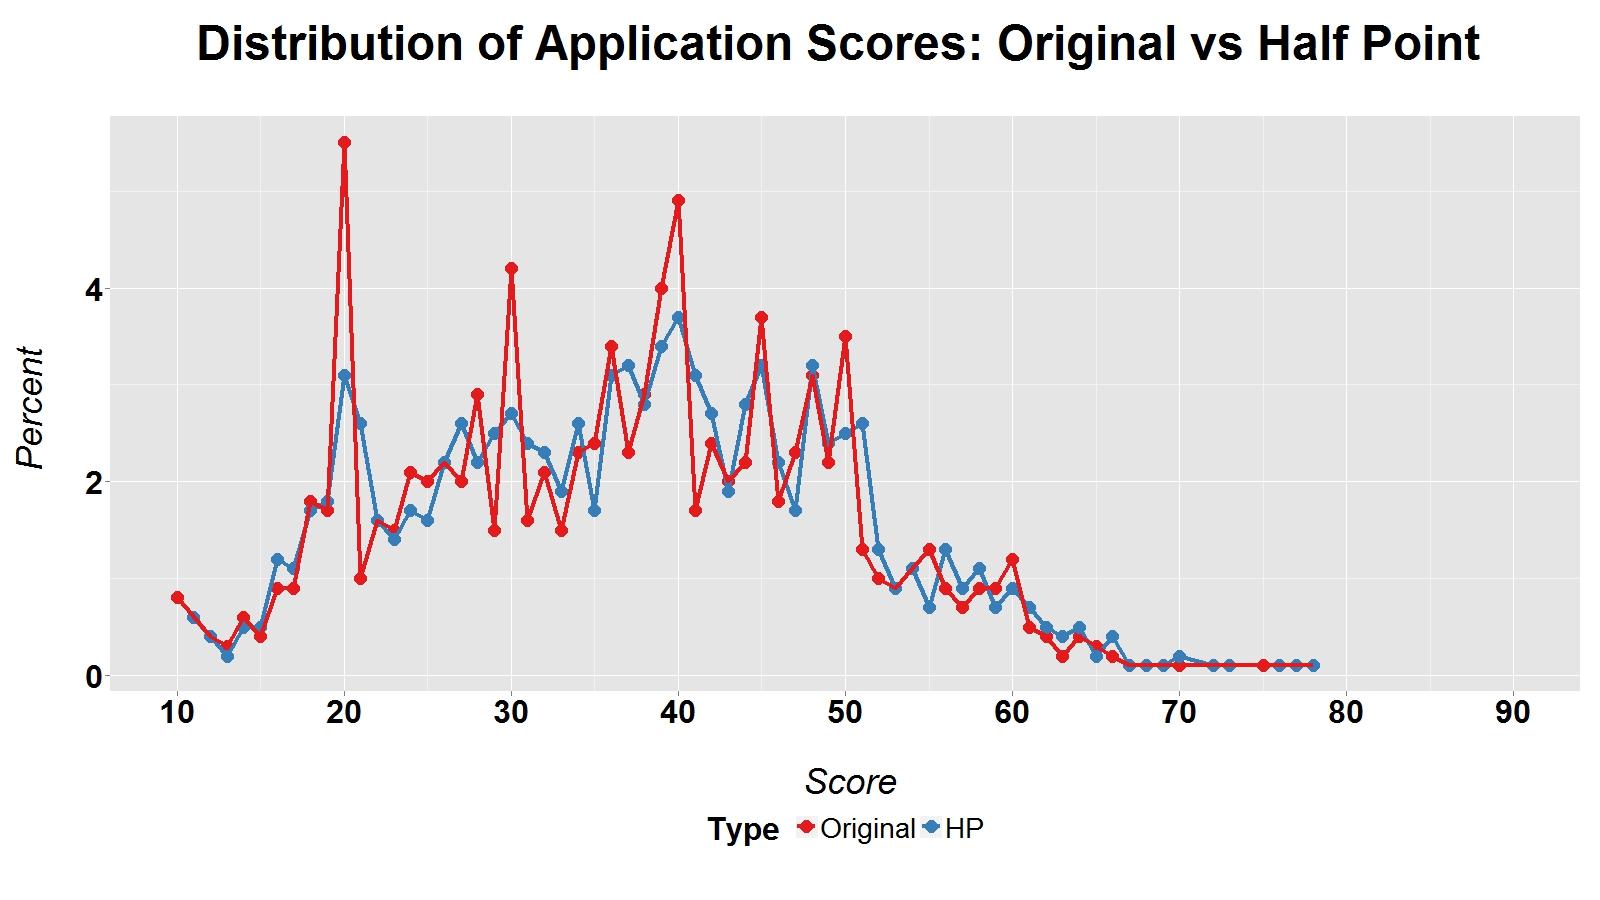 Distribution of Application Scores graph